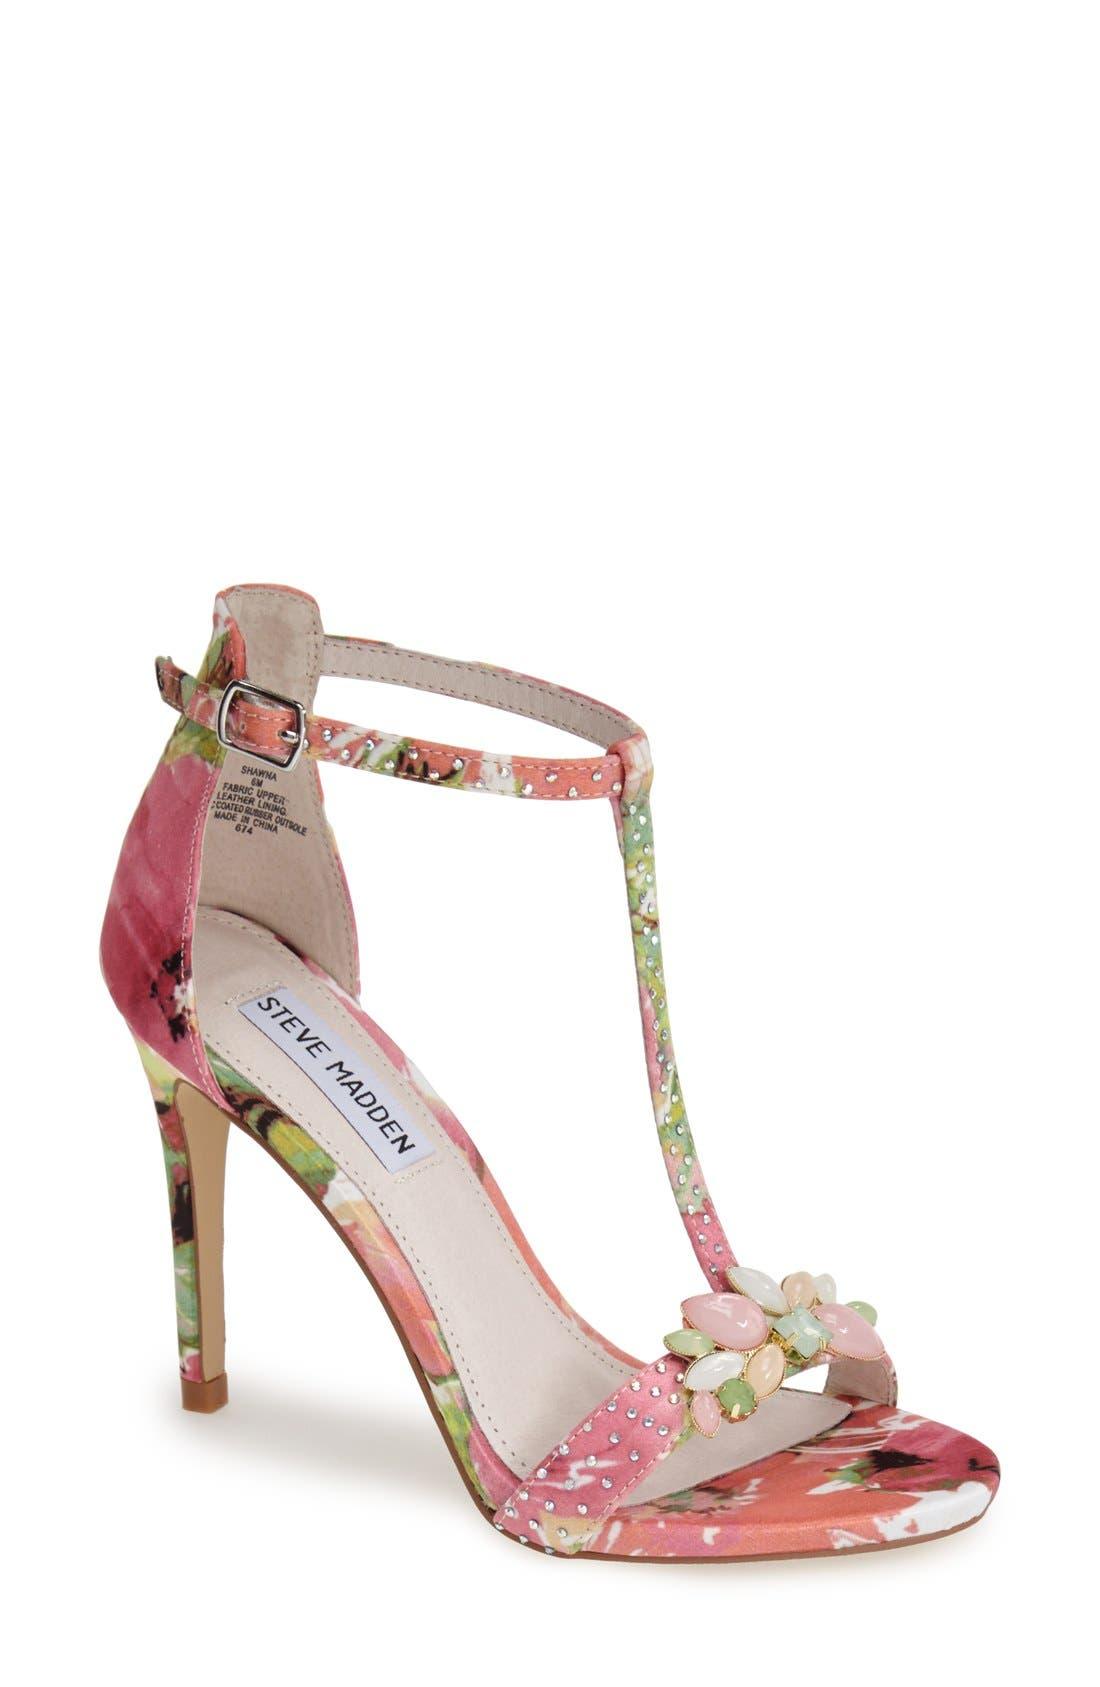 Alternate Image 1 Selected - Steve Madden 'Shawna' Embellished T-Strap Sandal (Women)